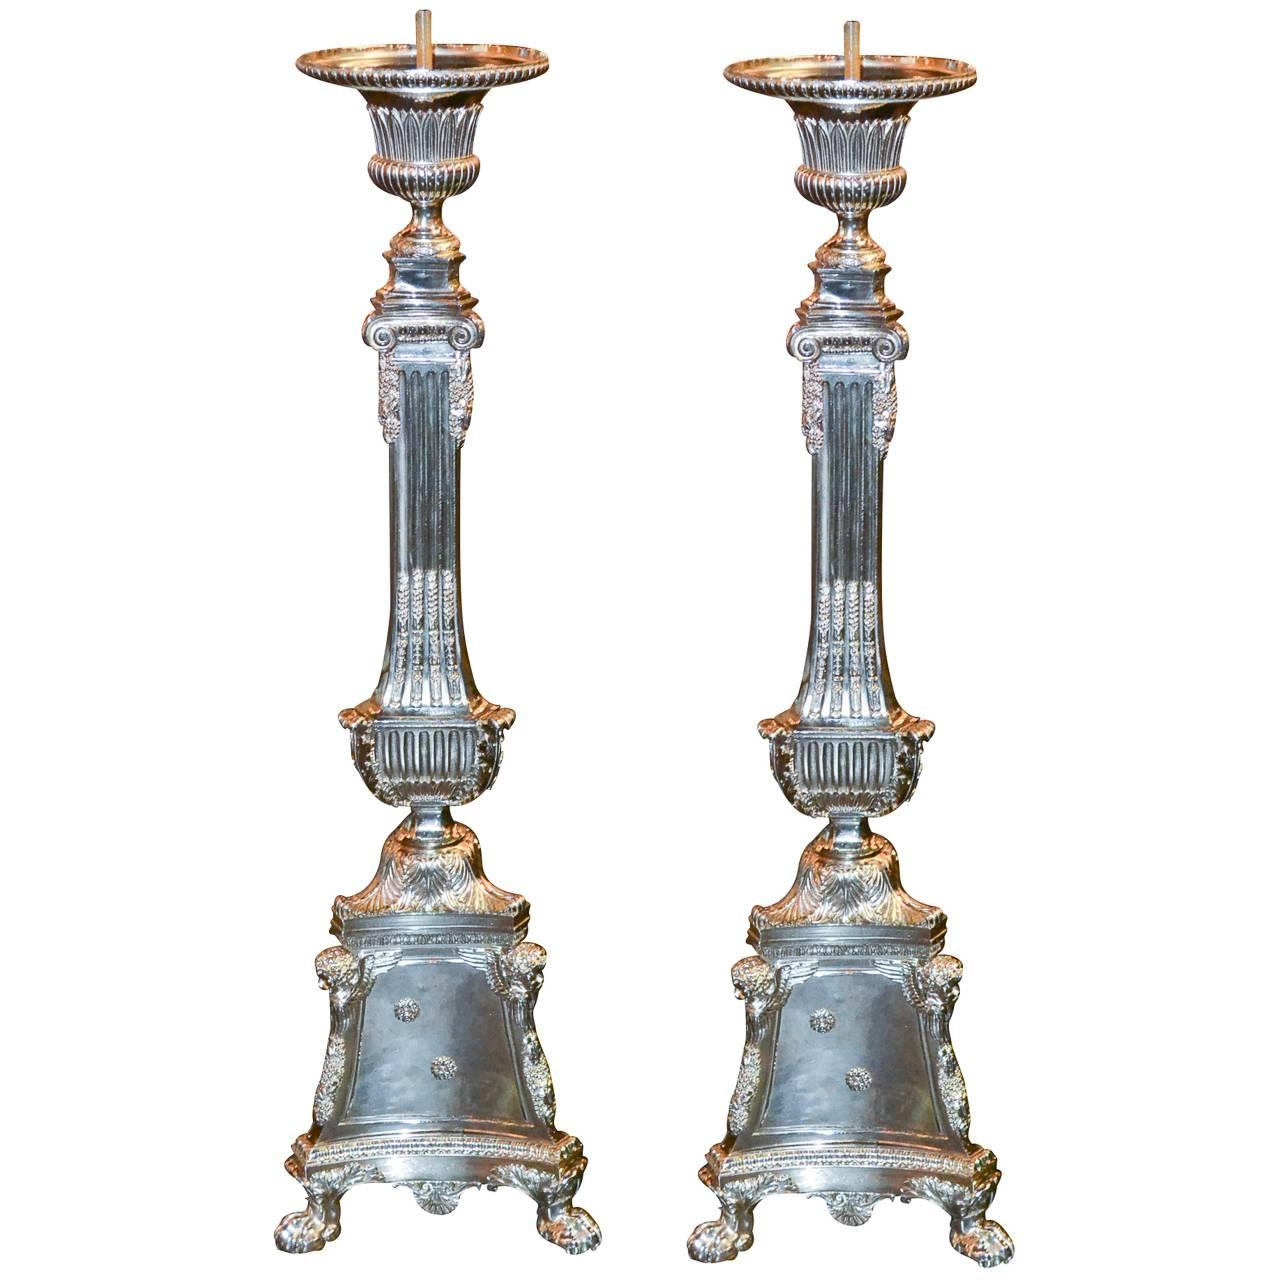 Pair of 19th Century French Altar Sticks